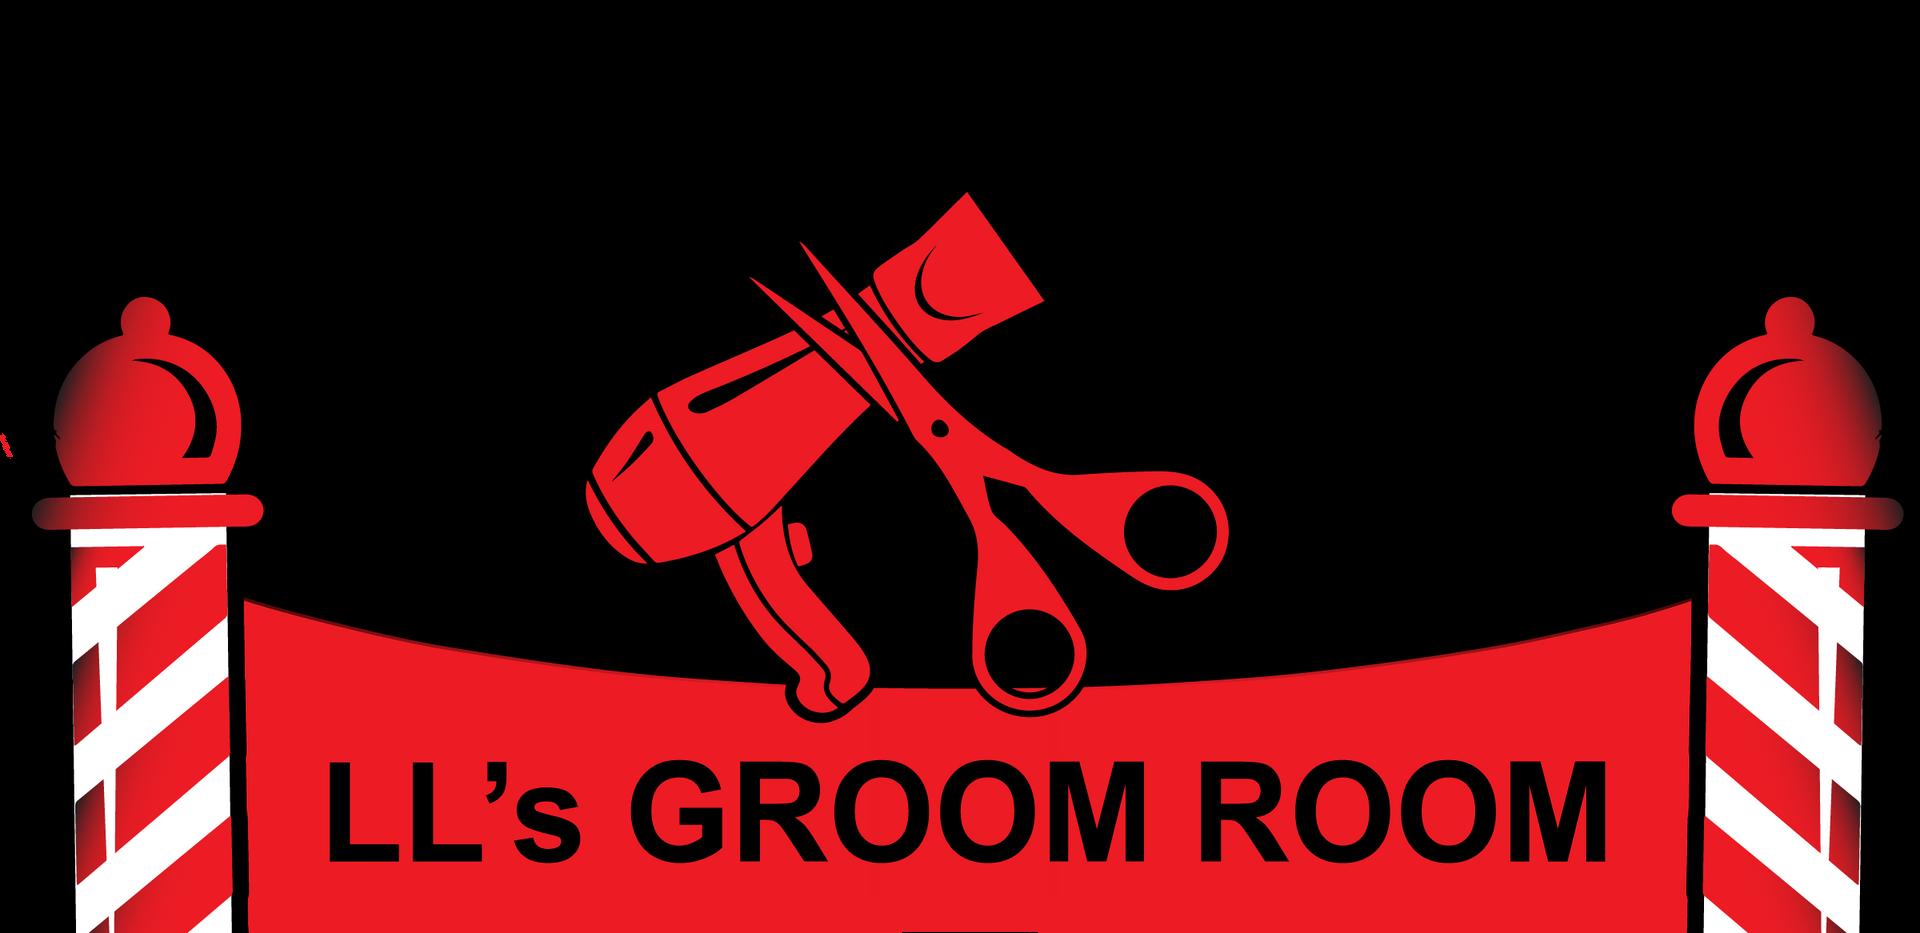 LL's Groom Room.png